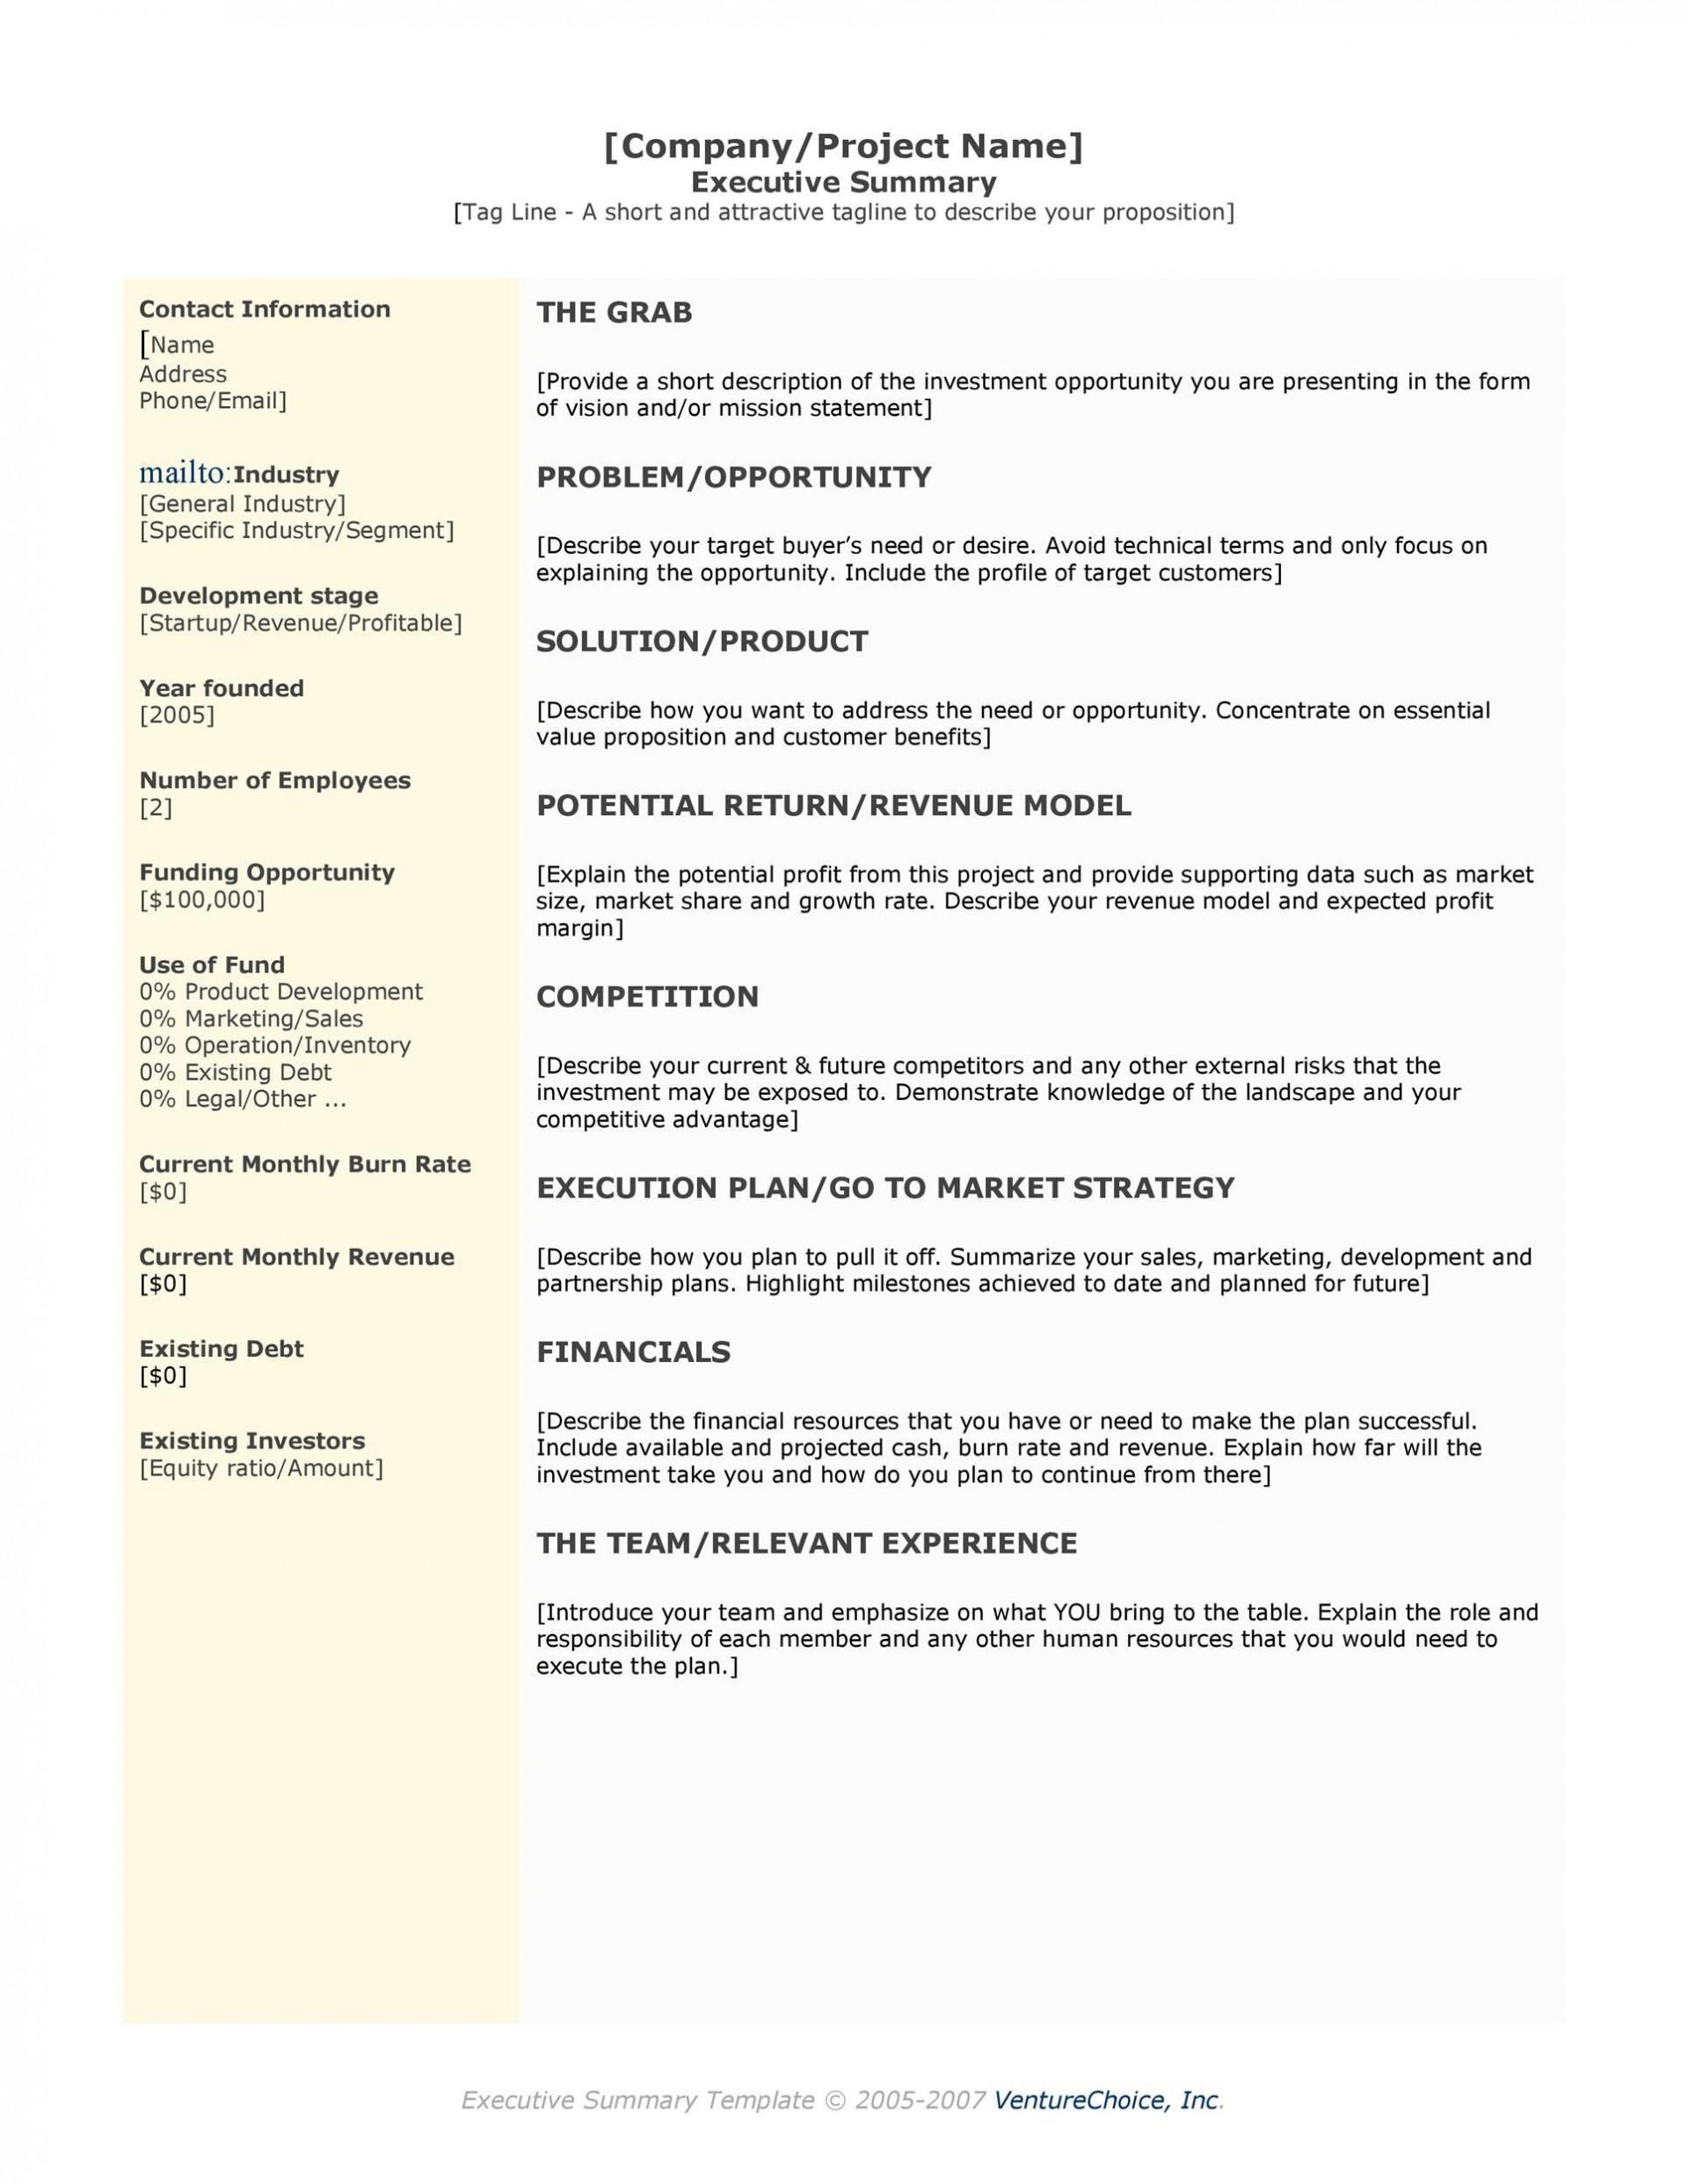 003 Stunning Executive Summary Template Doc Design  Document Example Google1920